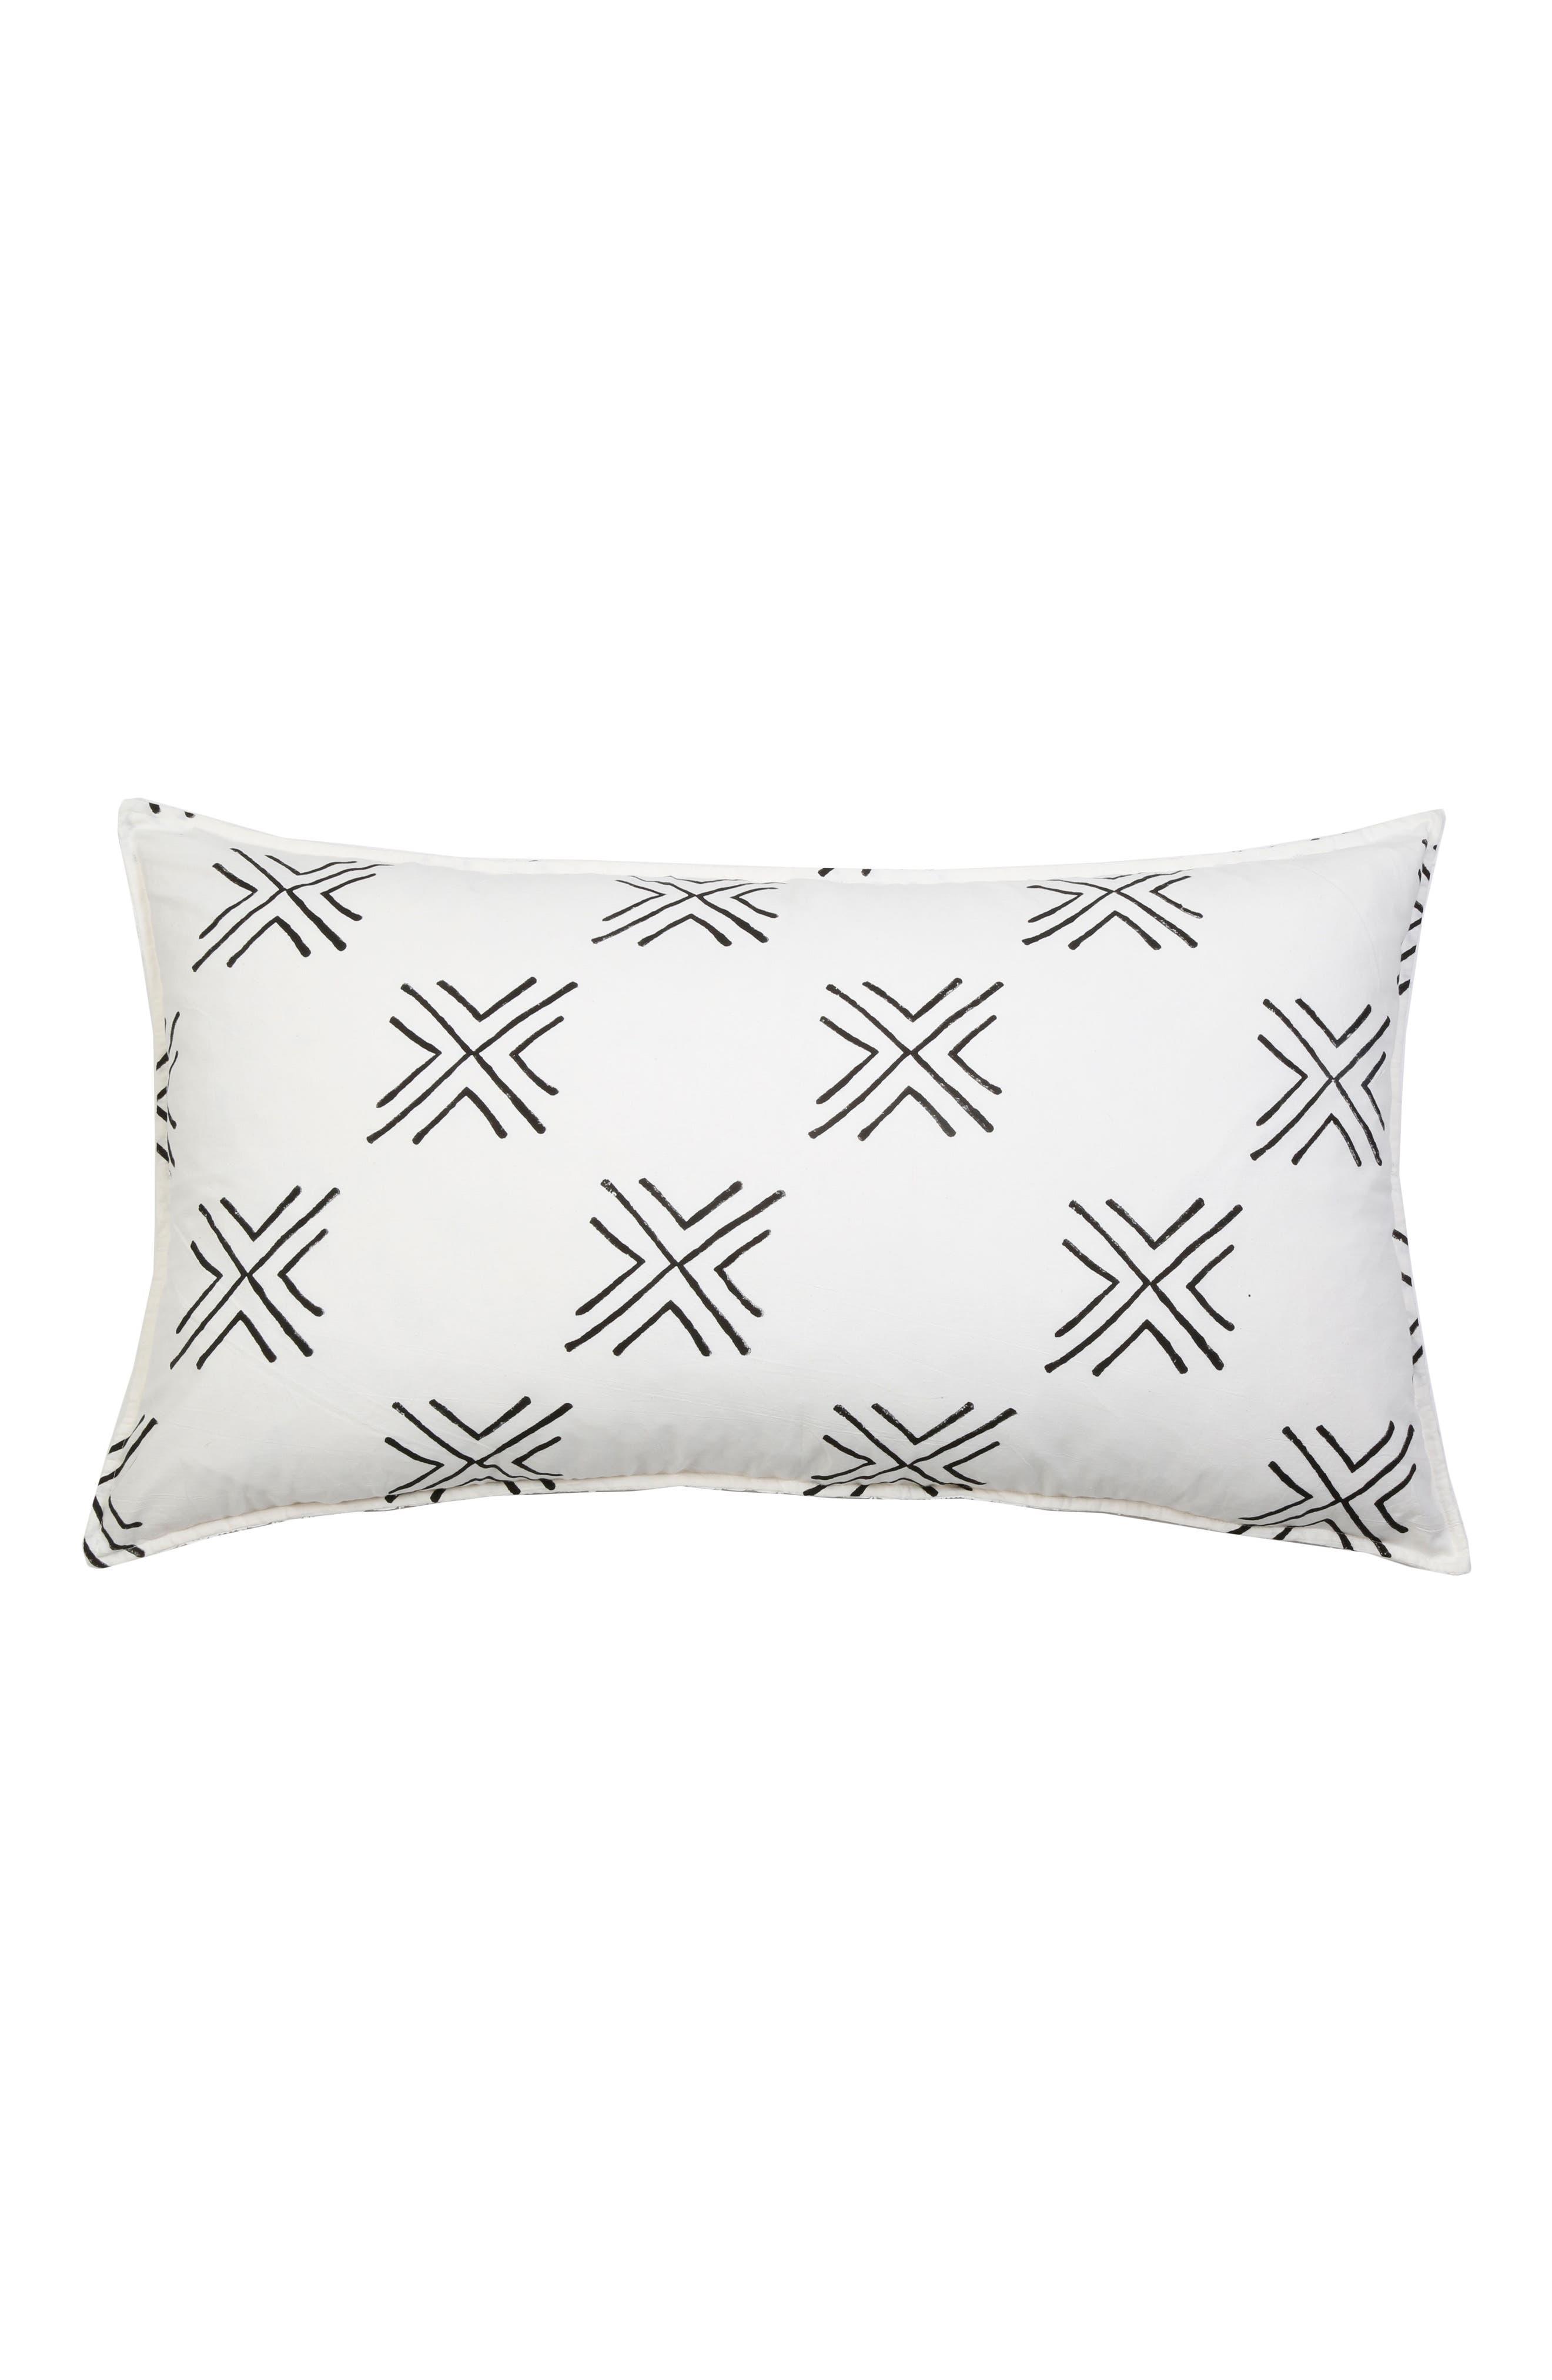 Arrow Accent Pillow,                             Main thumbnail 1, color,                             100